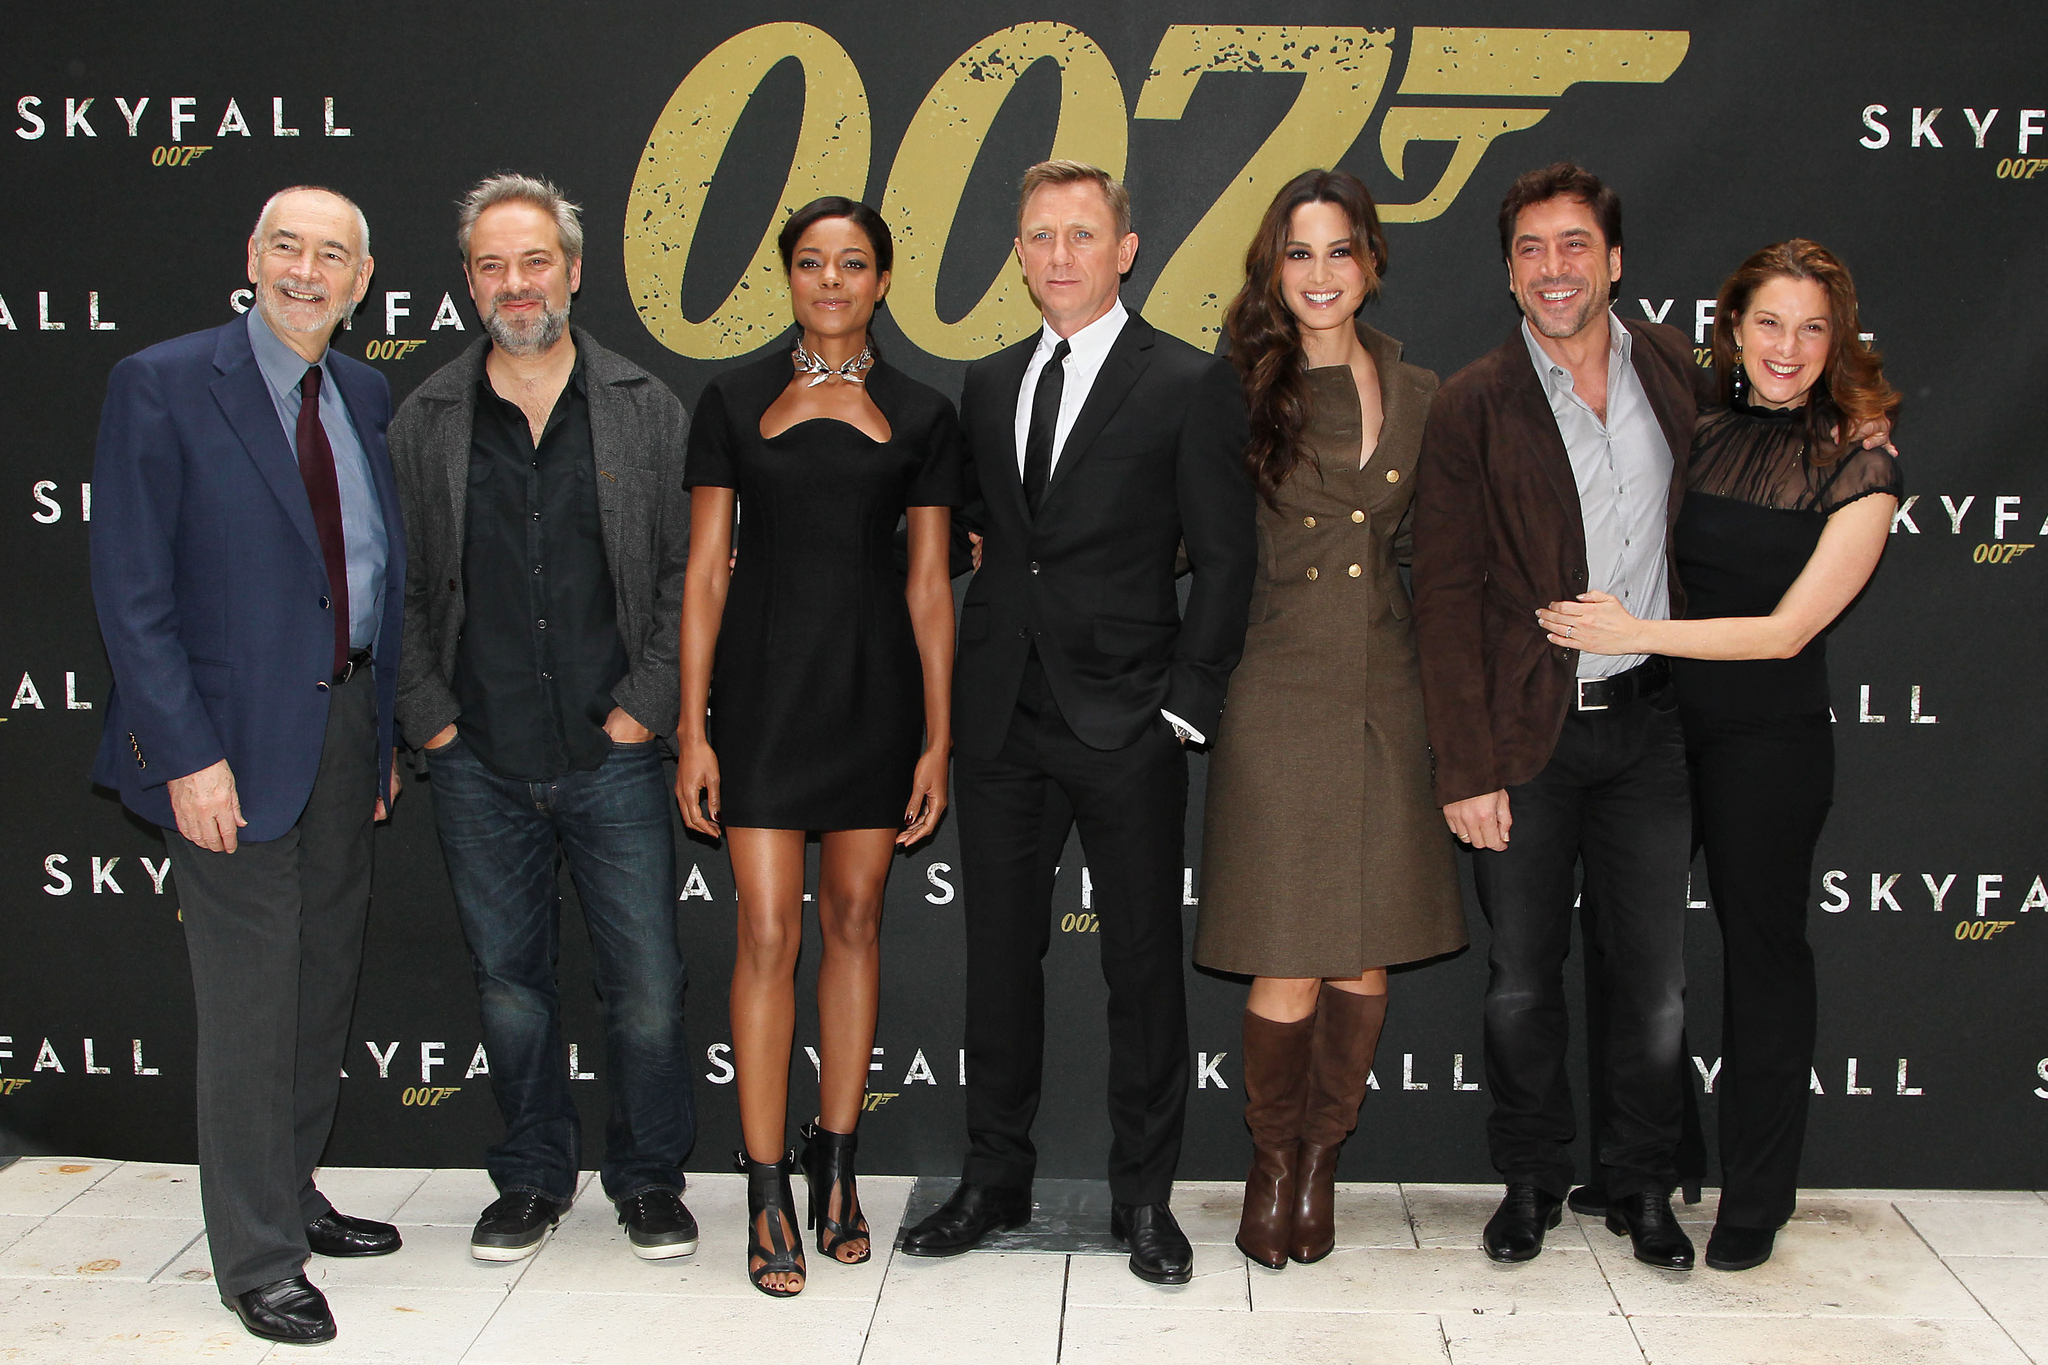 Javier Bardem, Sam Mendes, Barbara Broccoli, Daniel Craig, Naomie Harris, Michael G. Wilson, and Bérénice Marlohe at an event for Skyfall (2012)